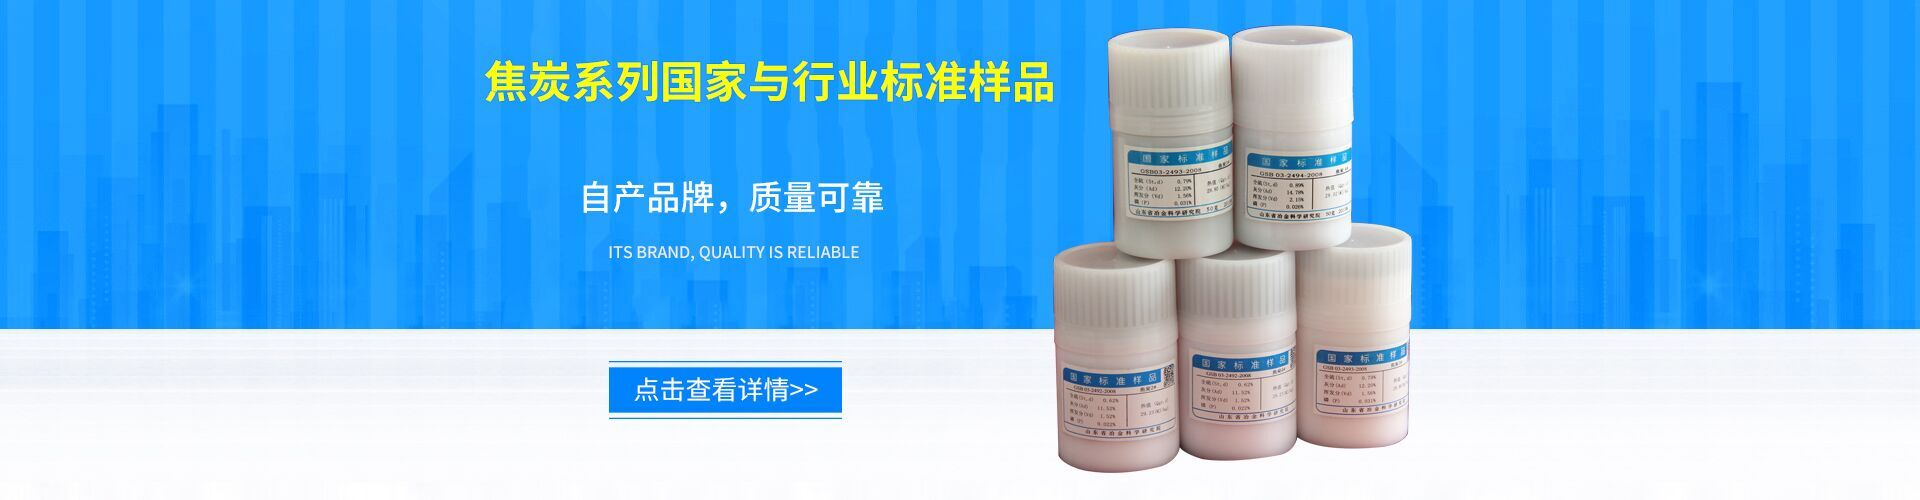 PH标准样品_标准样品分类相关-山东省冶金科学研究院有限公司